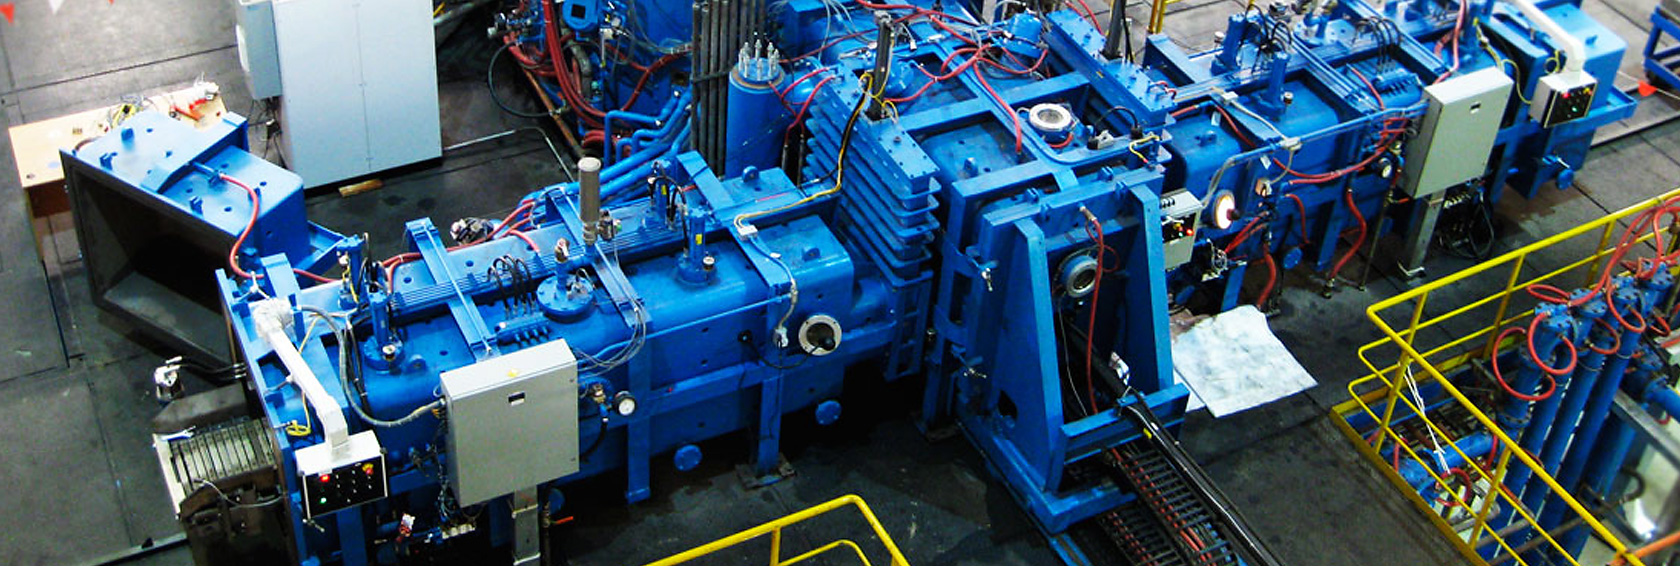 VFE plasma arc melting furnace